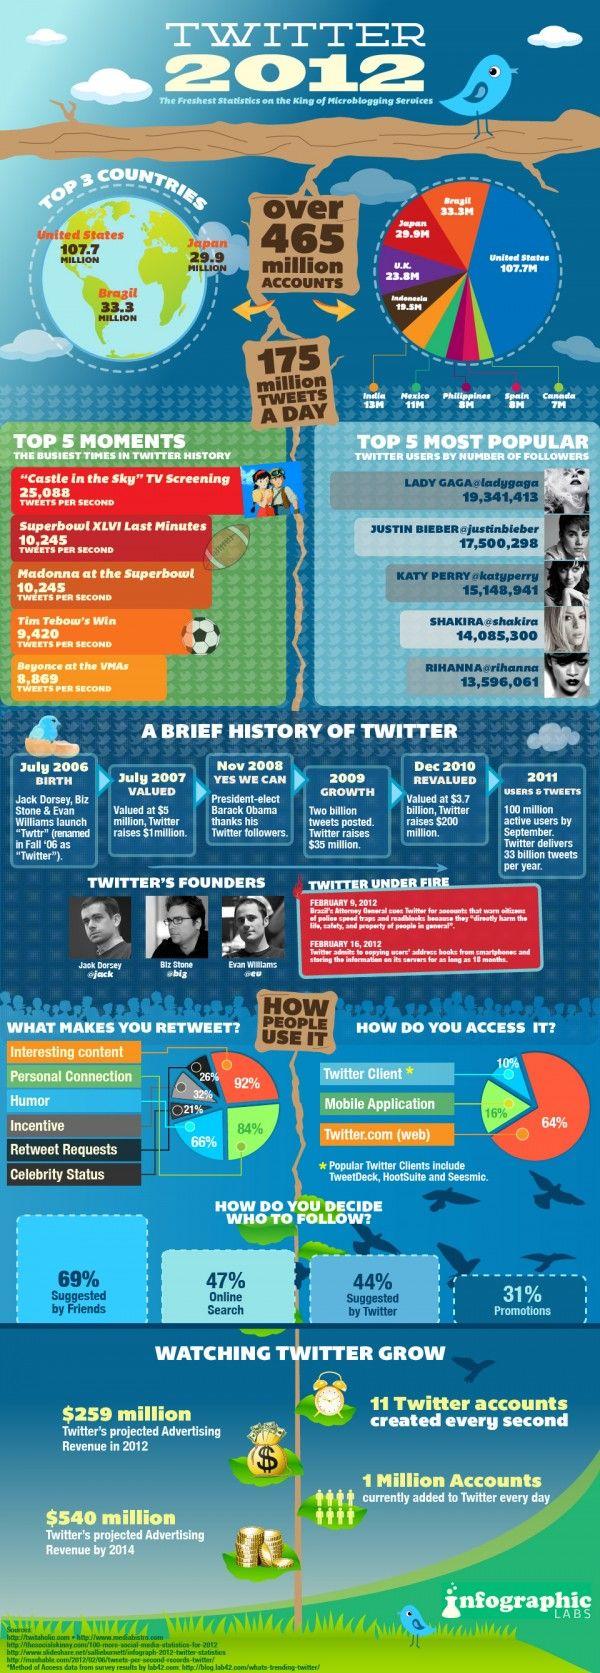 Statistiques Twitter 2012  www.business-on-line.fr